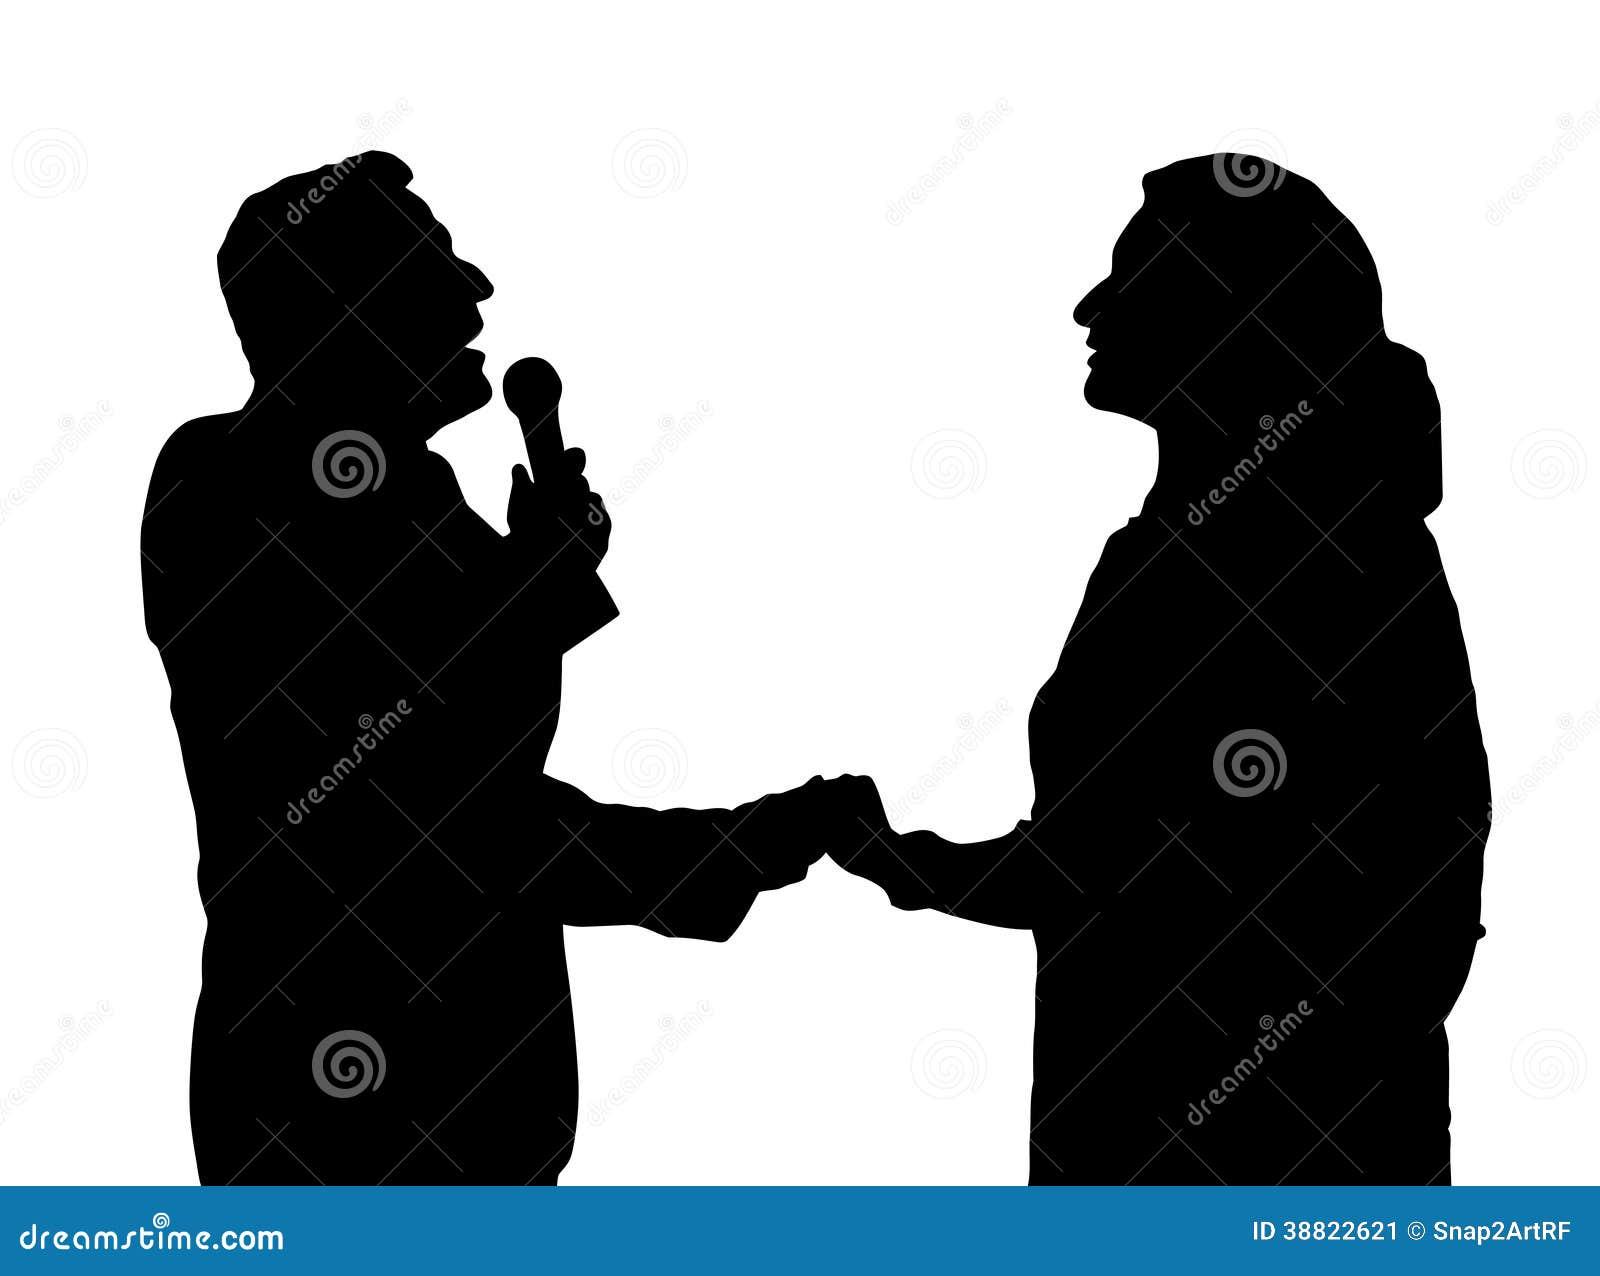 Opera Singers Silhouette Stock Vector - Image: 38822621